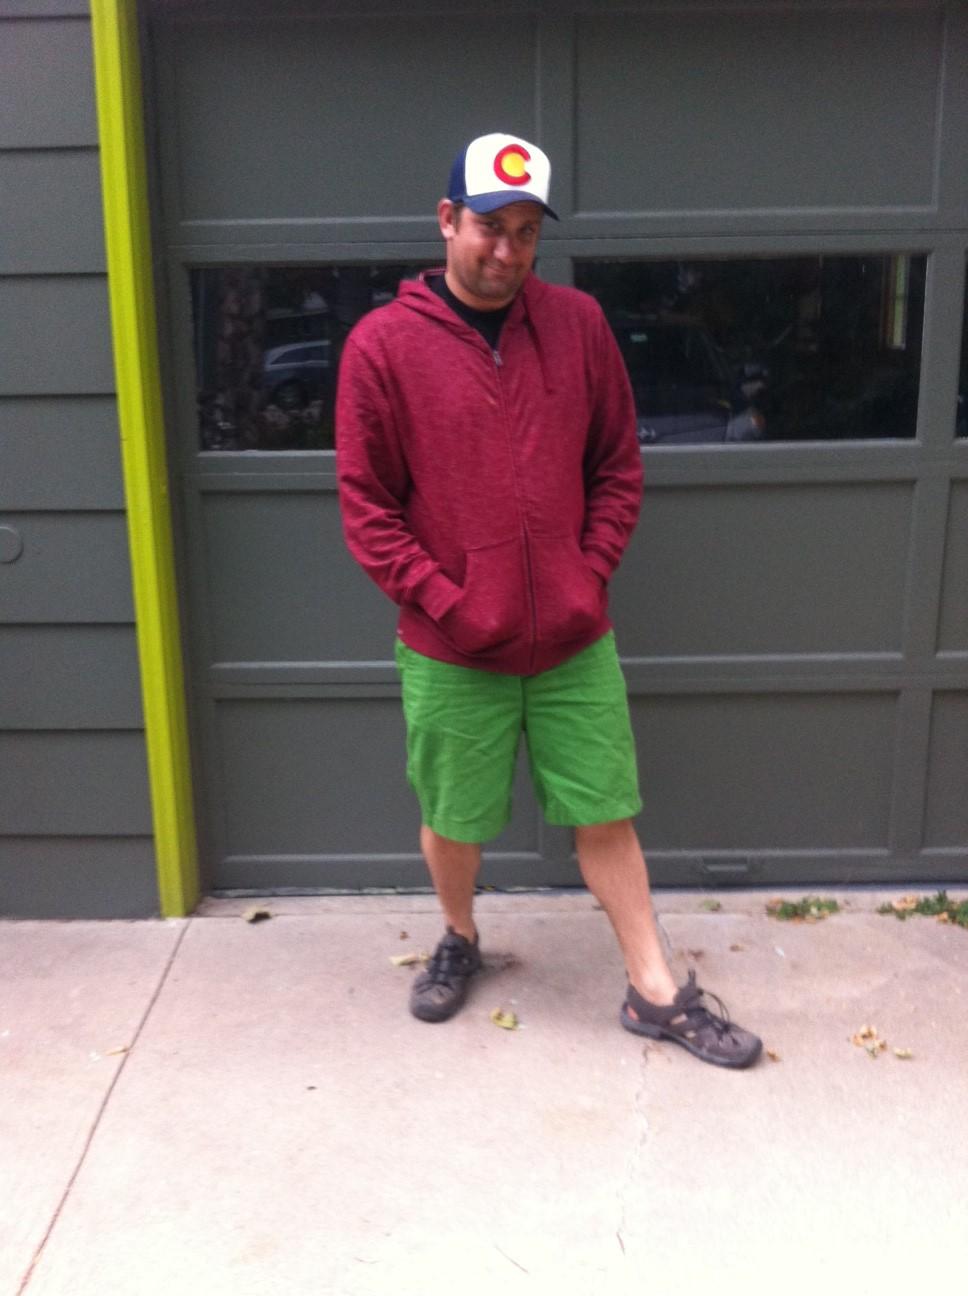 hilariously bad fashion on our daily walks around the neighborhood